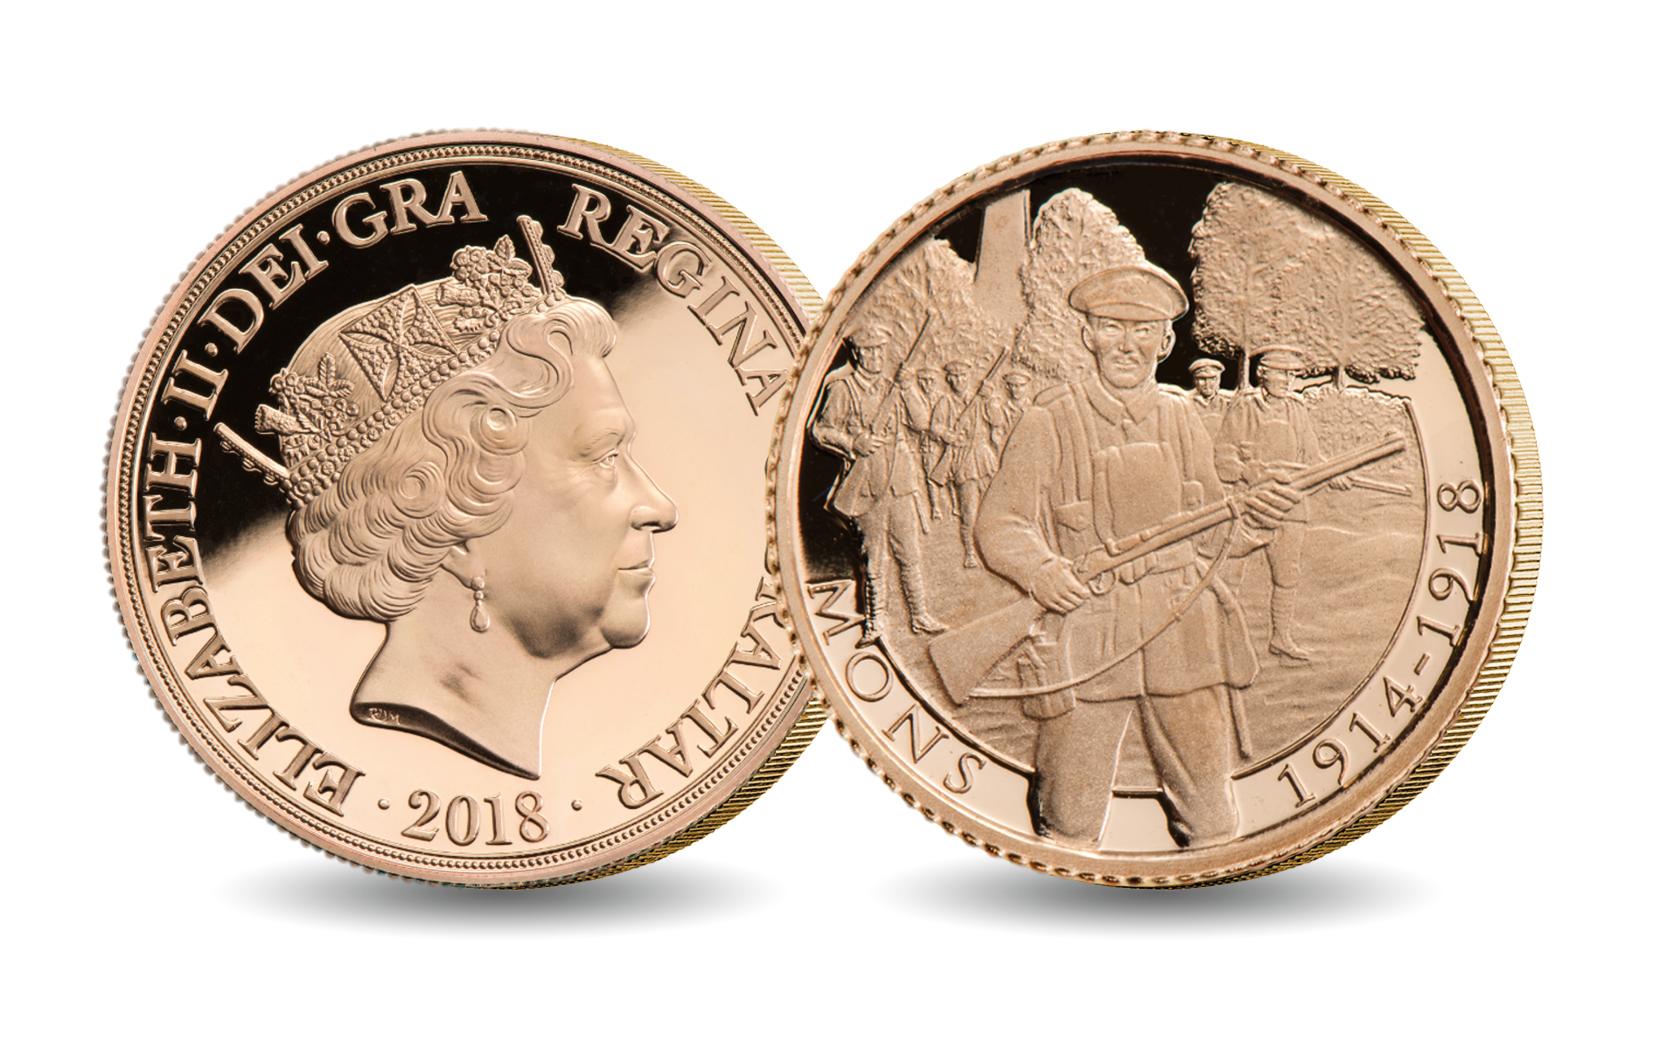 Penny Black 1/10oz. Gold | The Dublin Mint Office